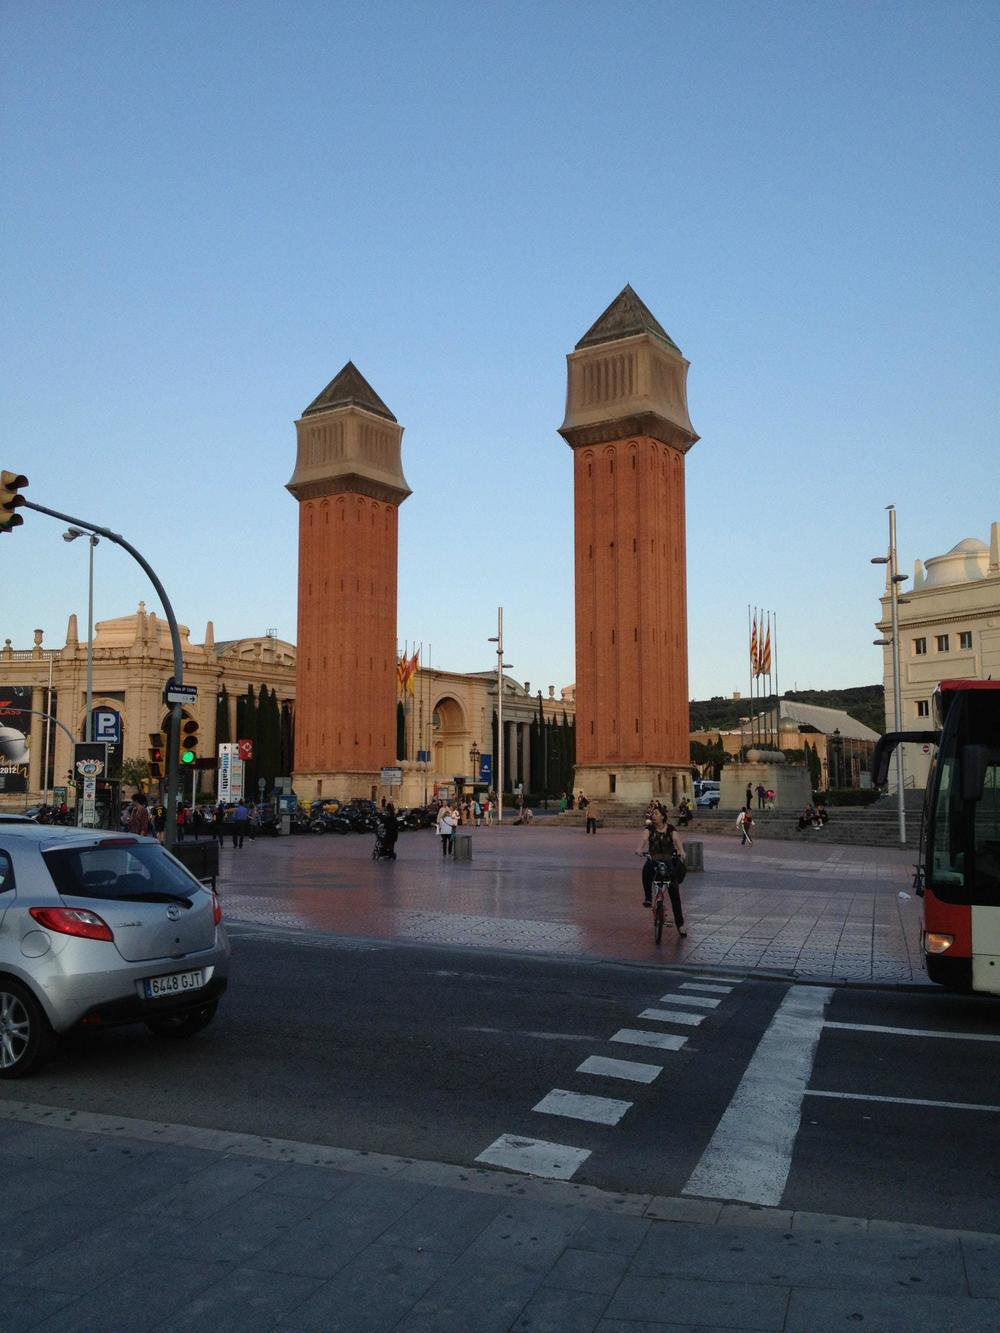 Barcelona, Spain,2013